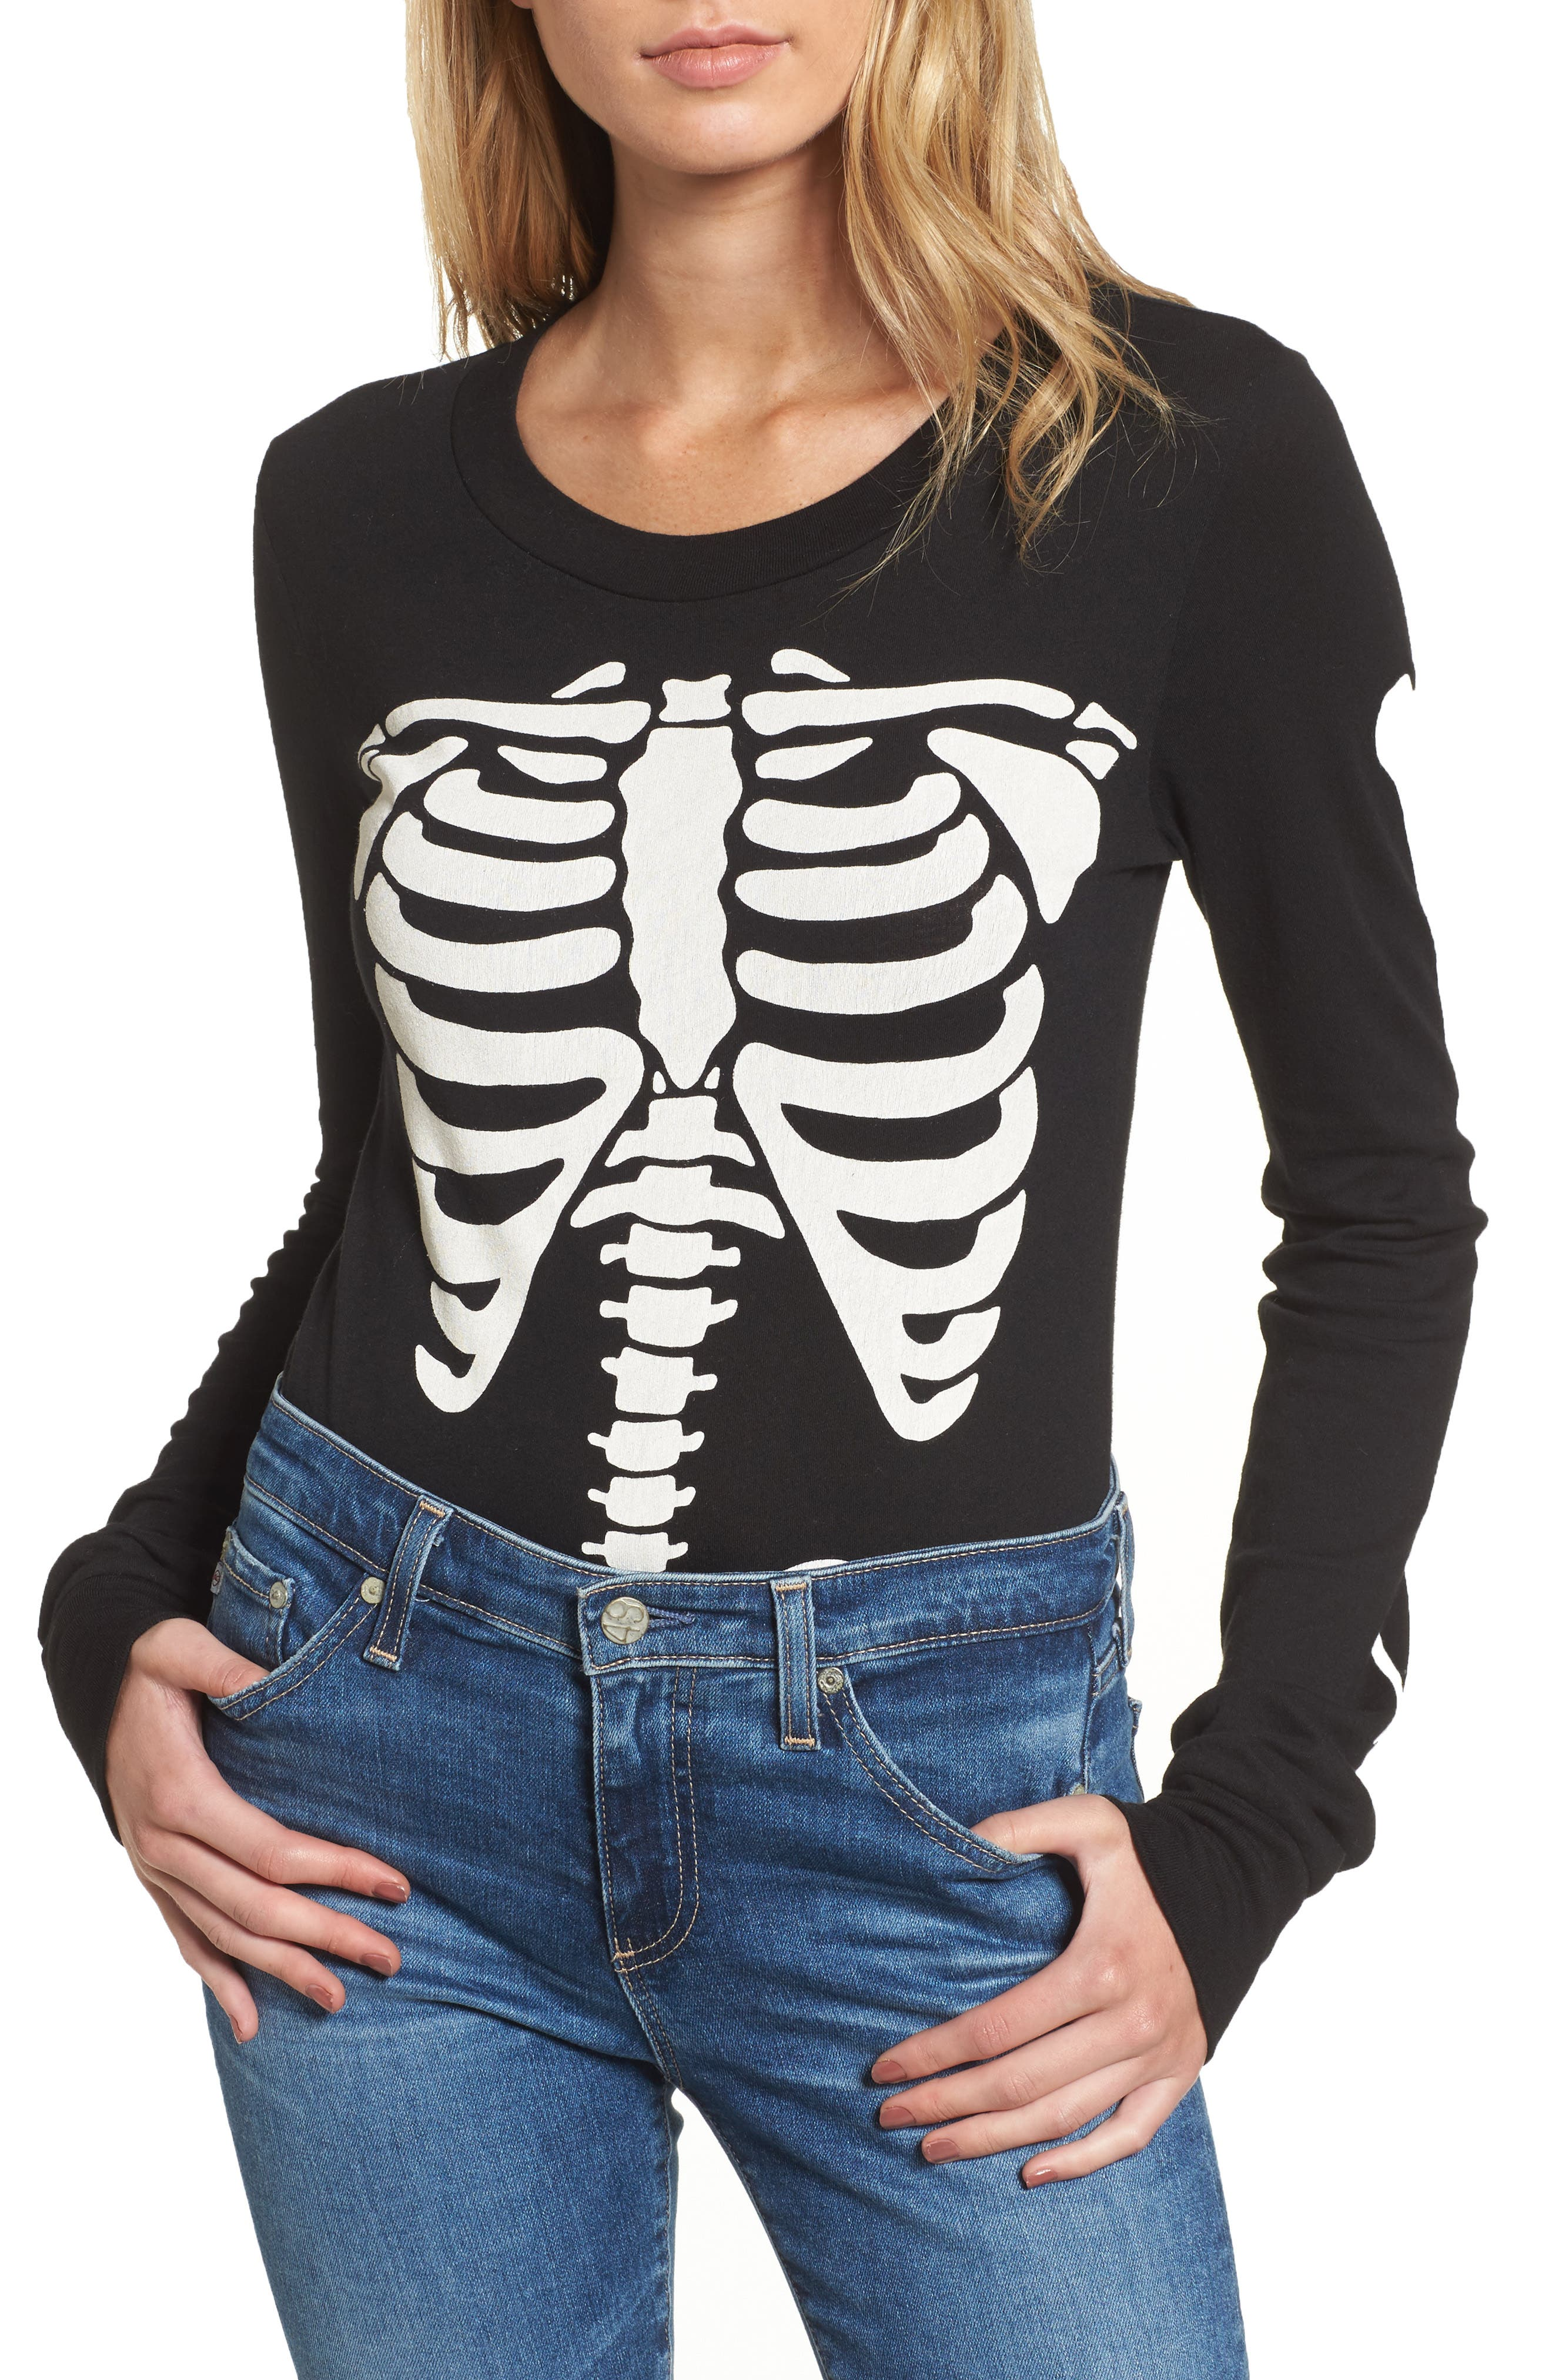 X-Ray Vision Bodysuit,                         Main,                         color, Black